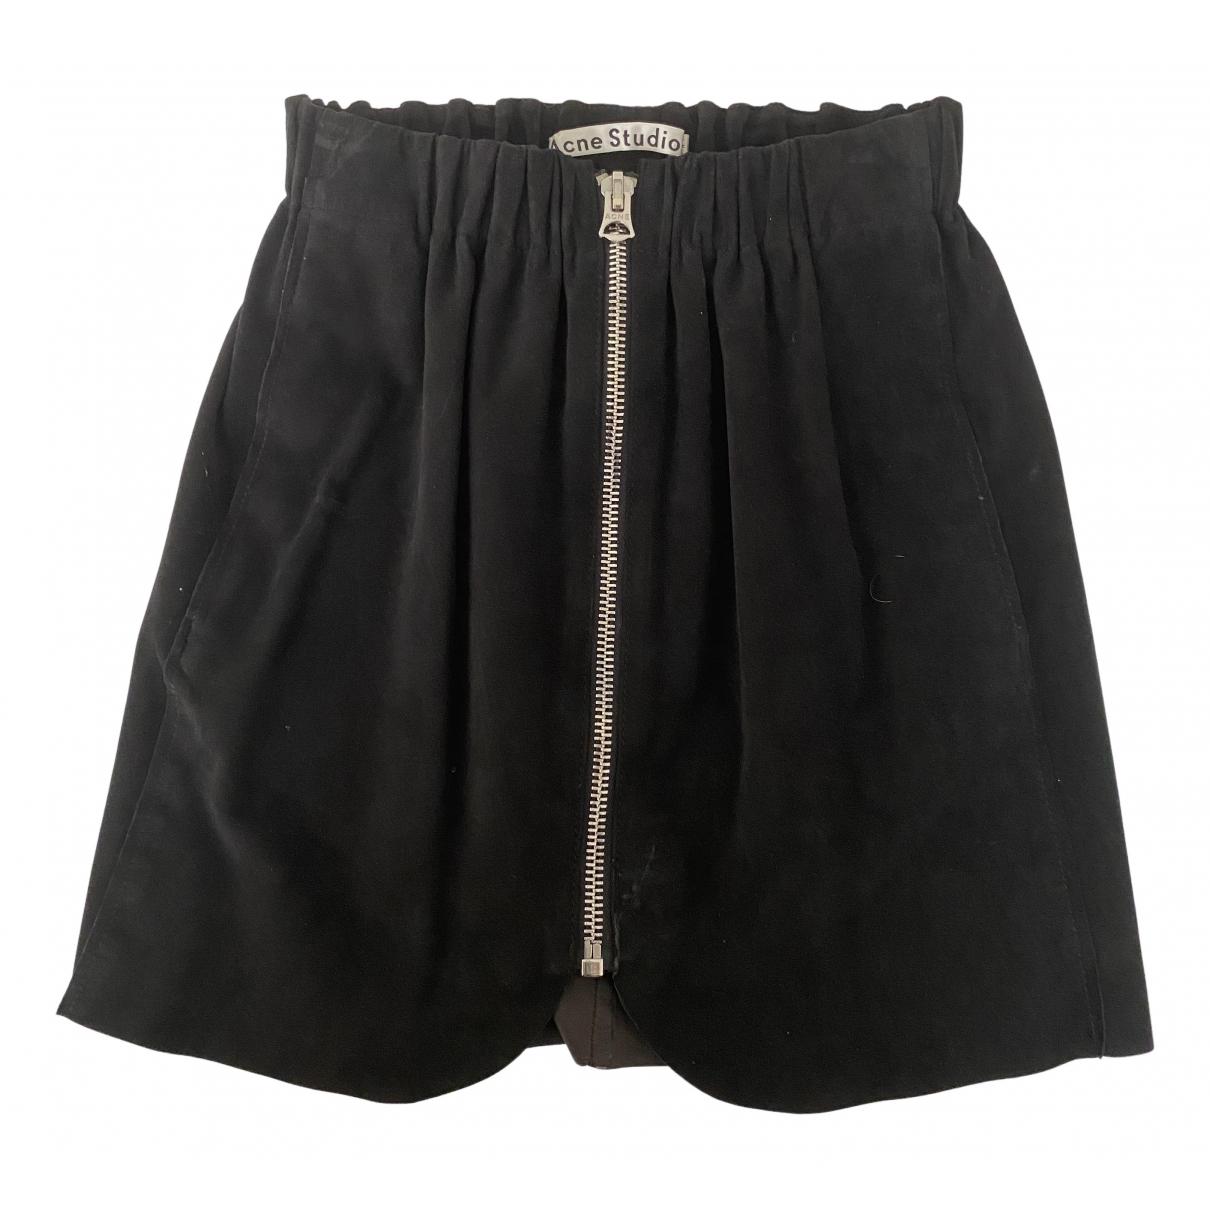 Acne Studios \N Black Suede skirt for Women 34 FR